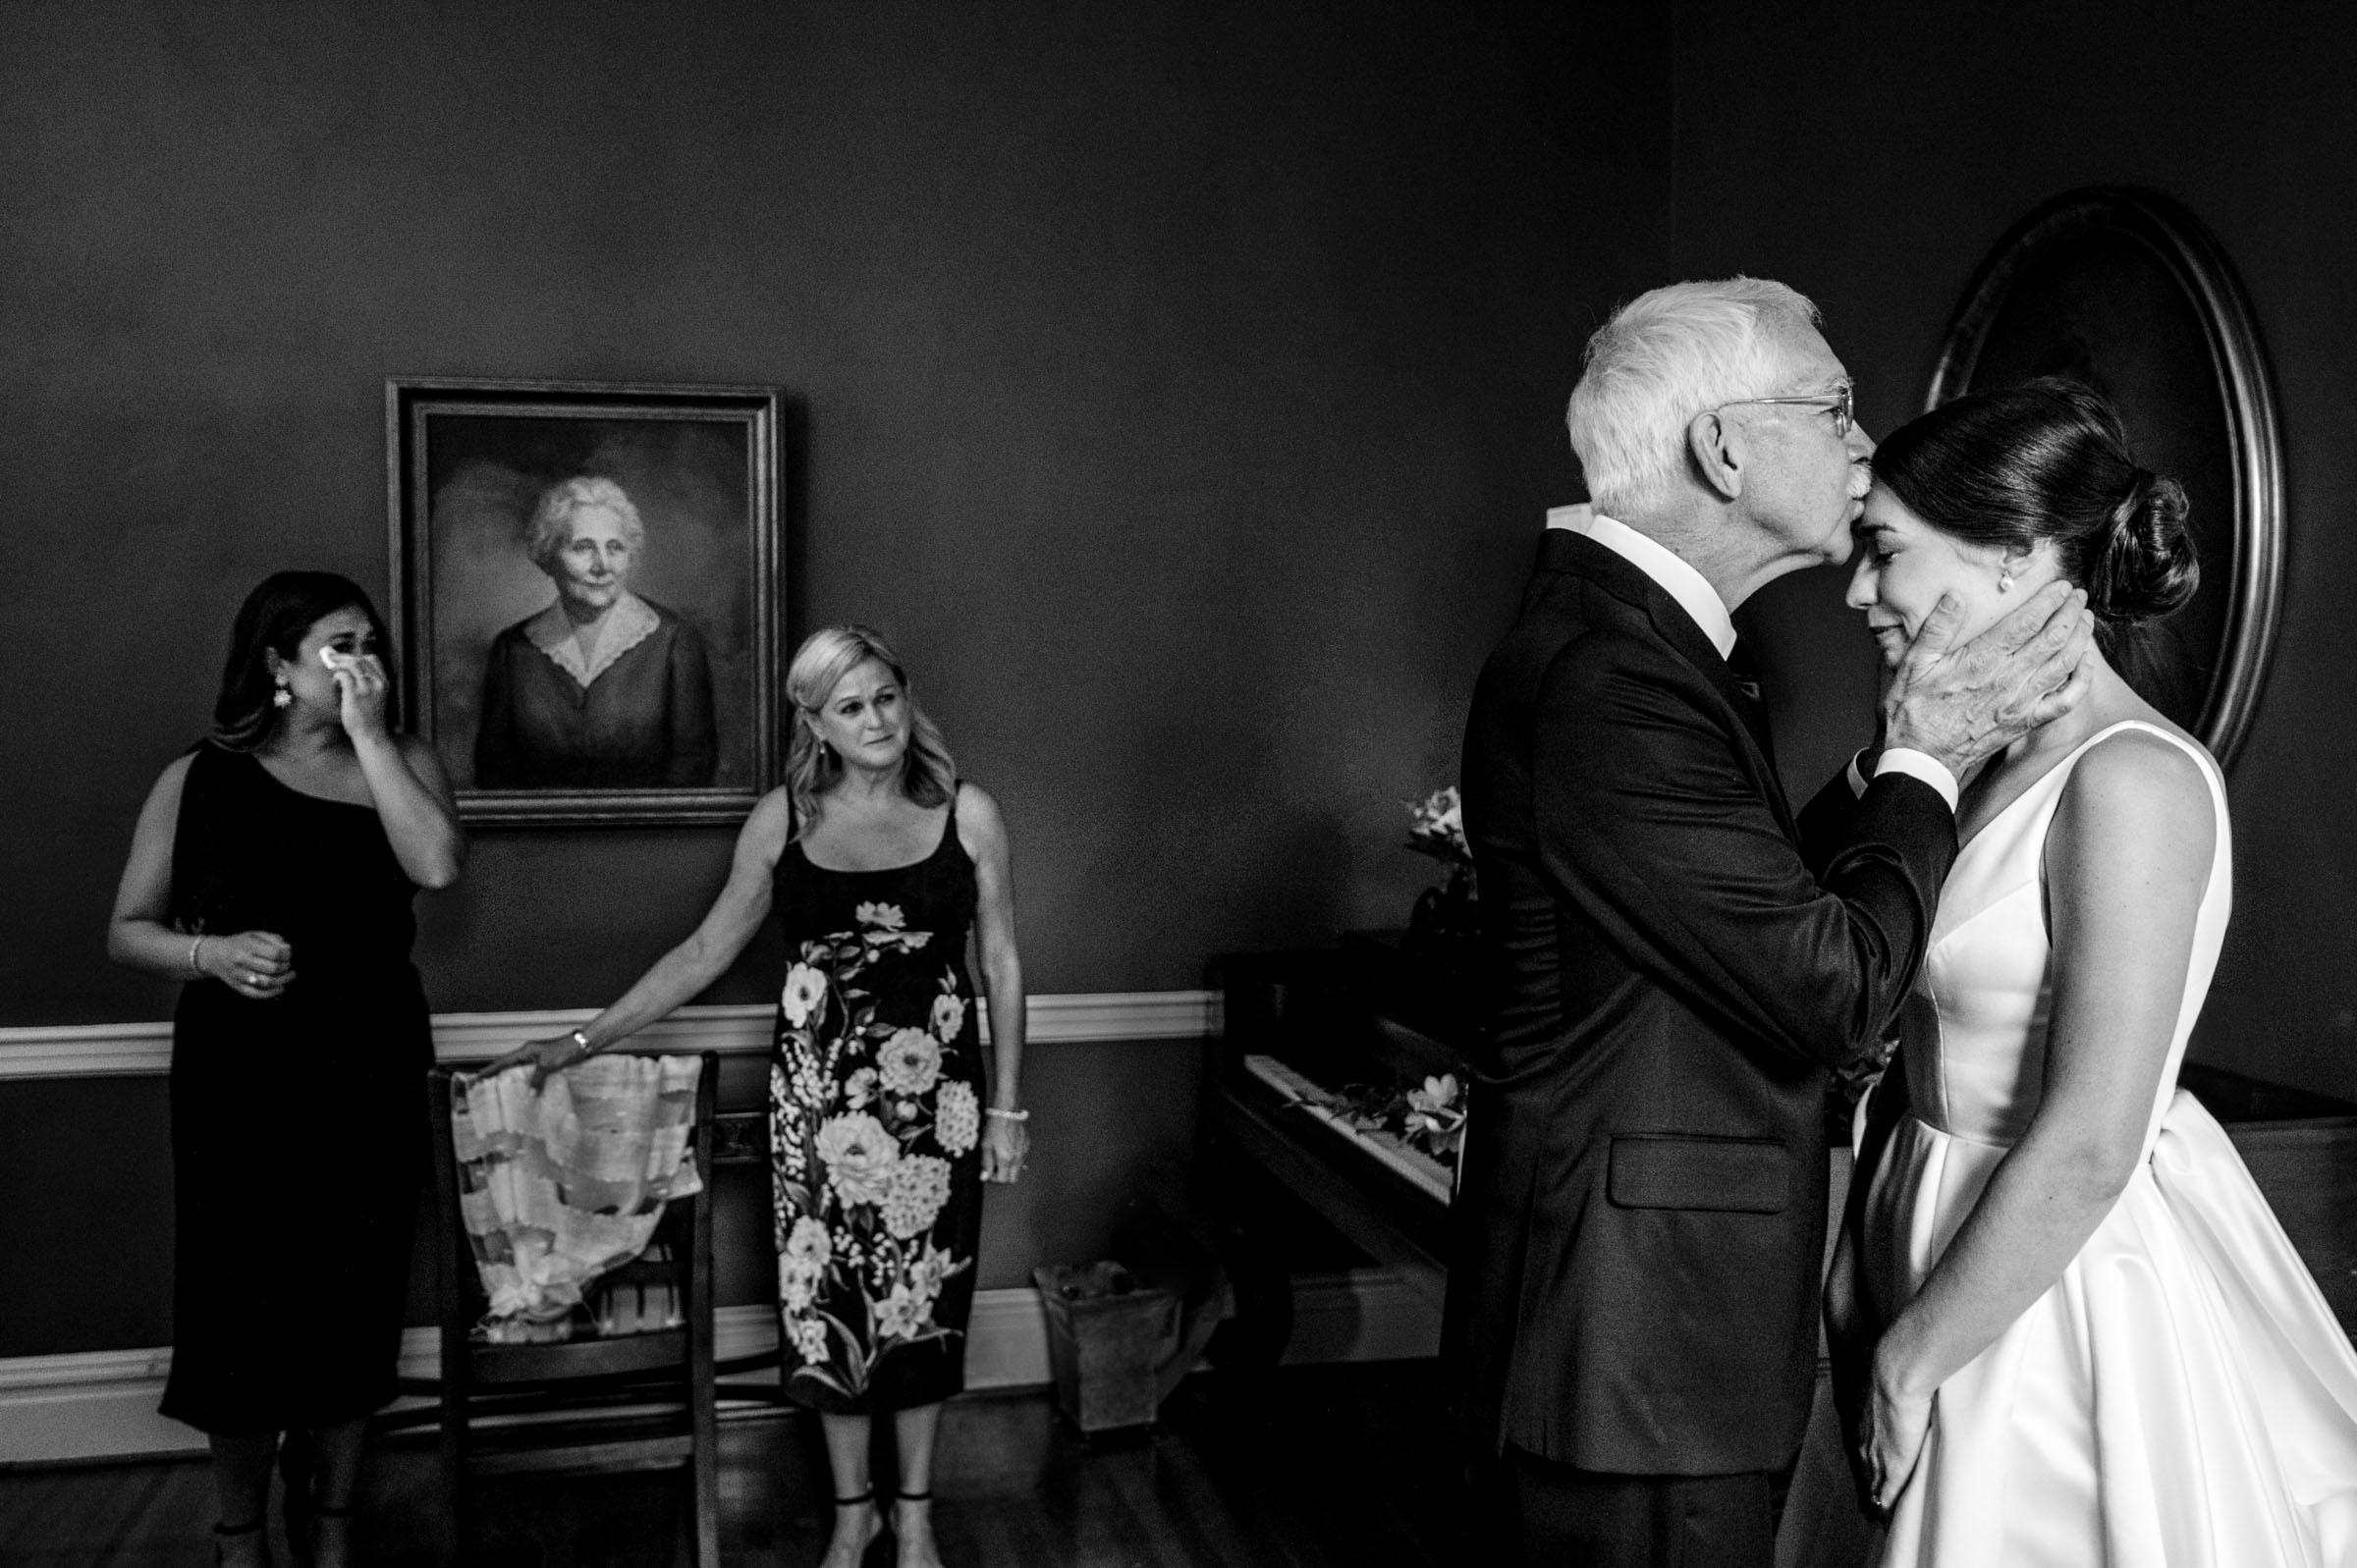 father-kisses-bride-s-forehead-marissa-joy-photography